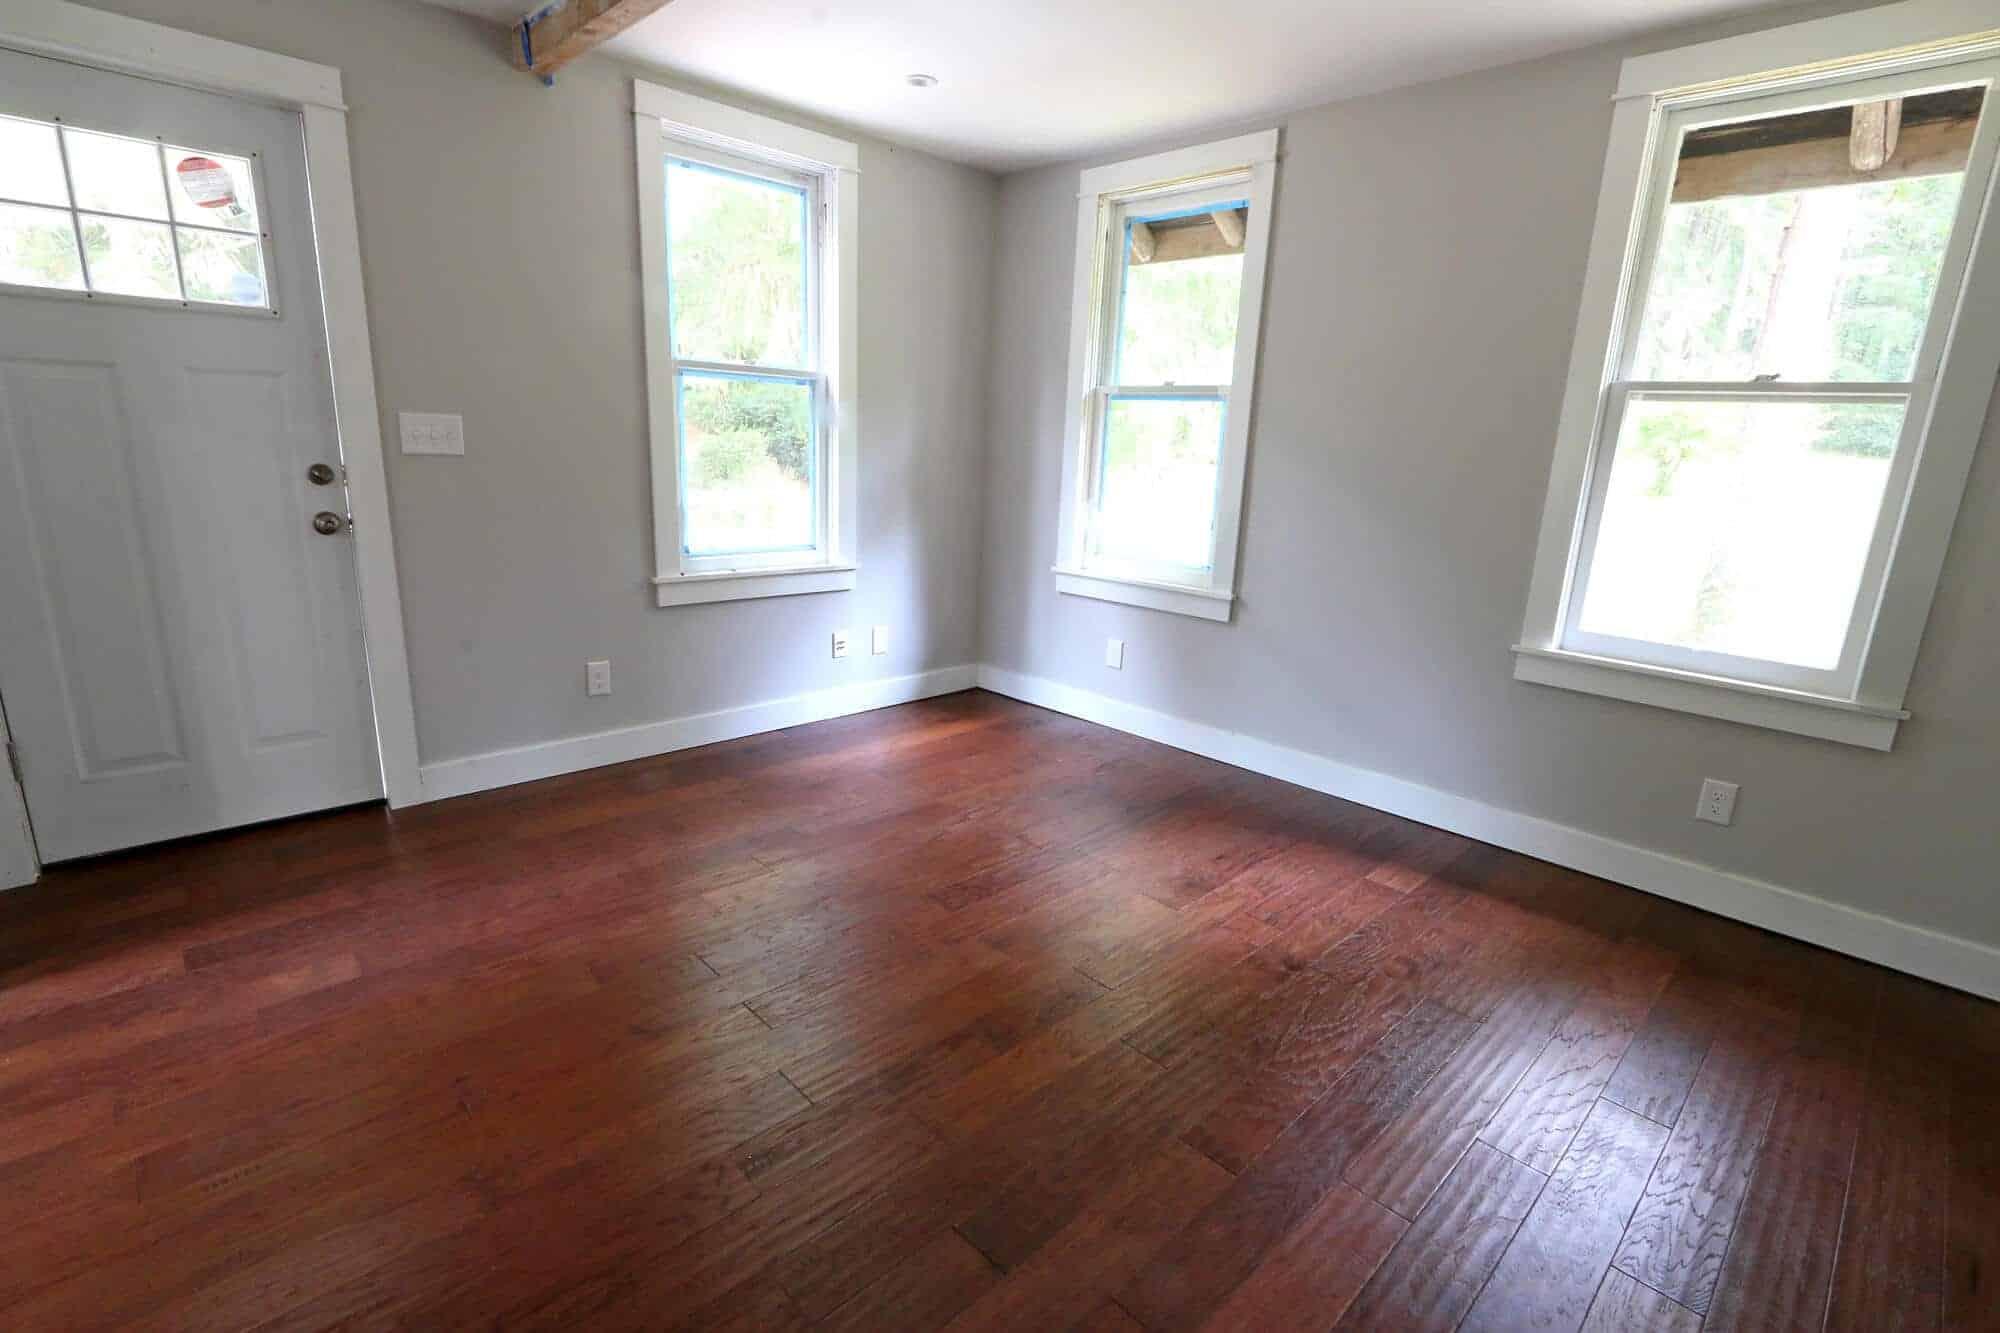 Hardwood Flooring Kitchener Flooring To Go All About Flooring Designs